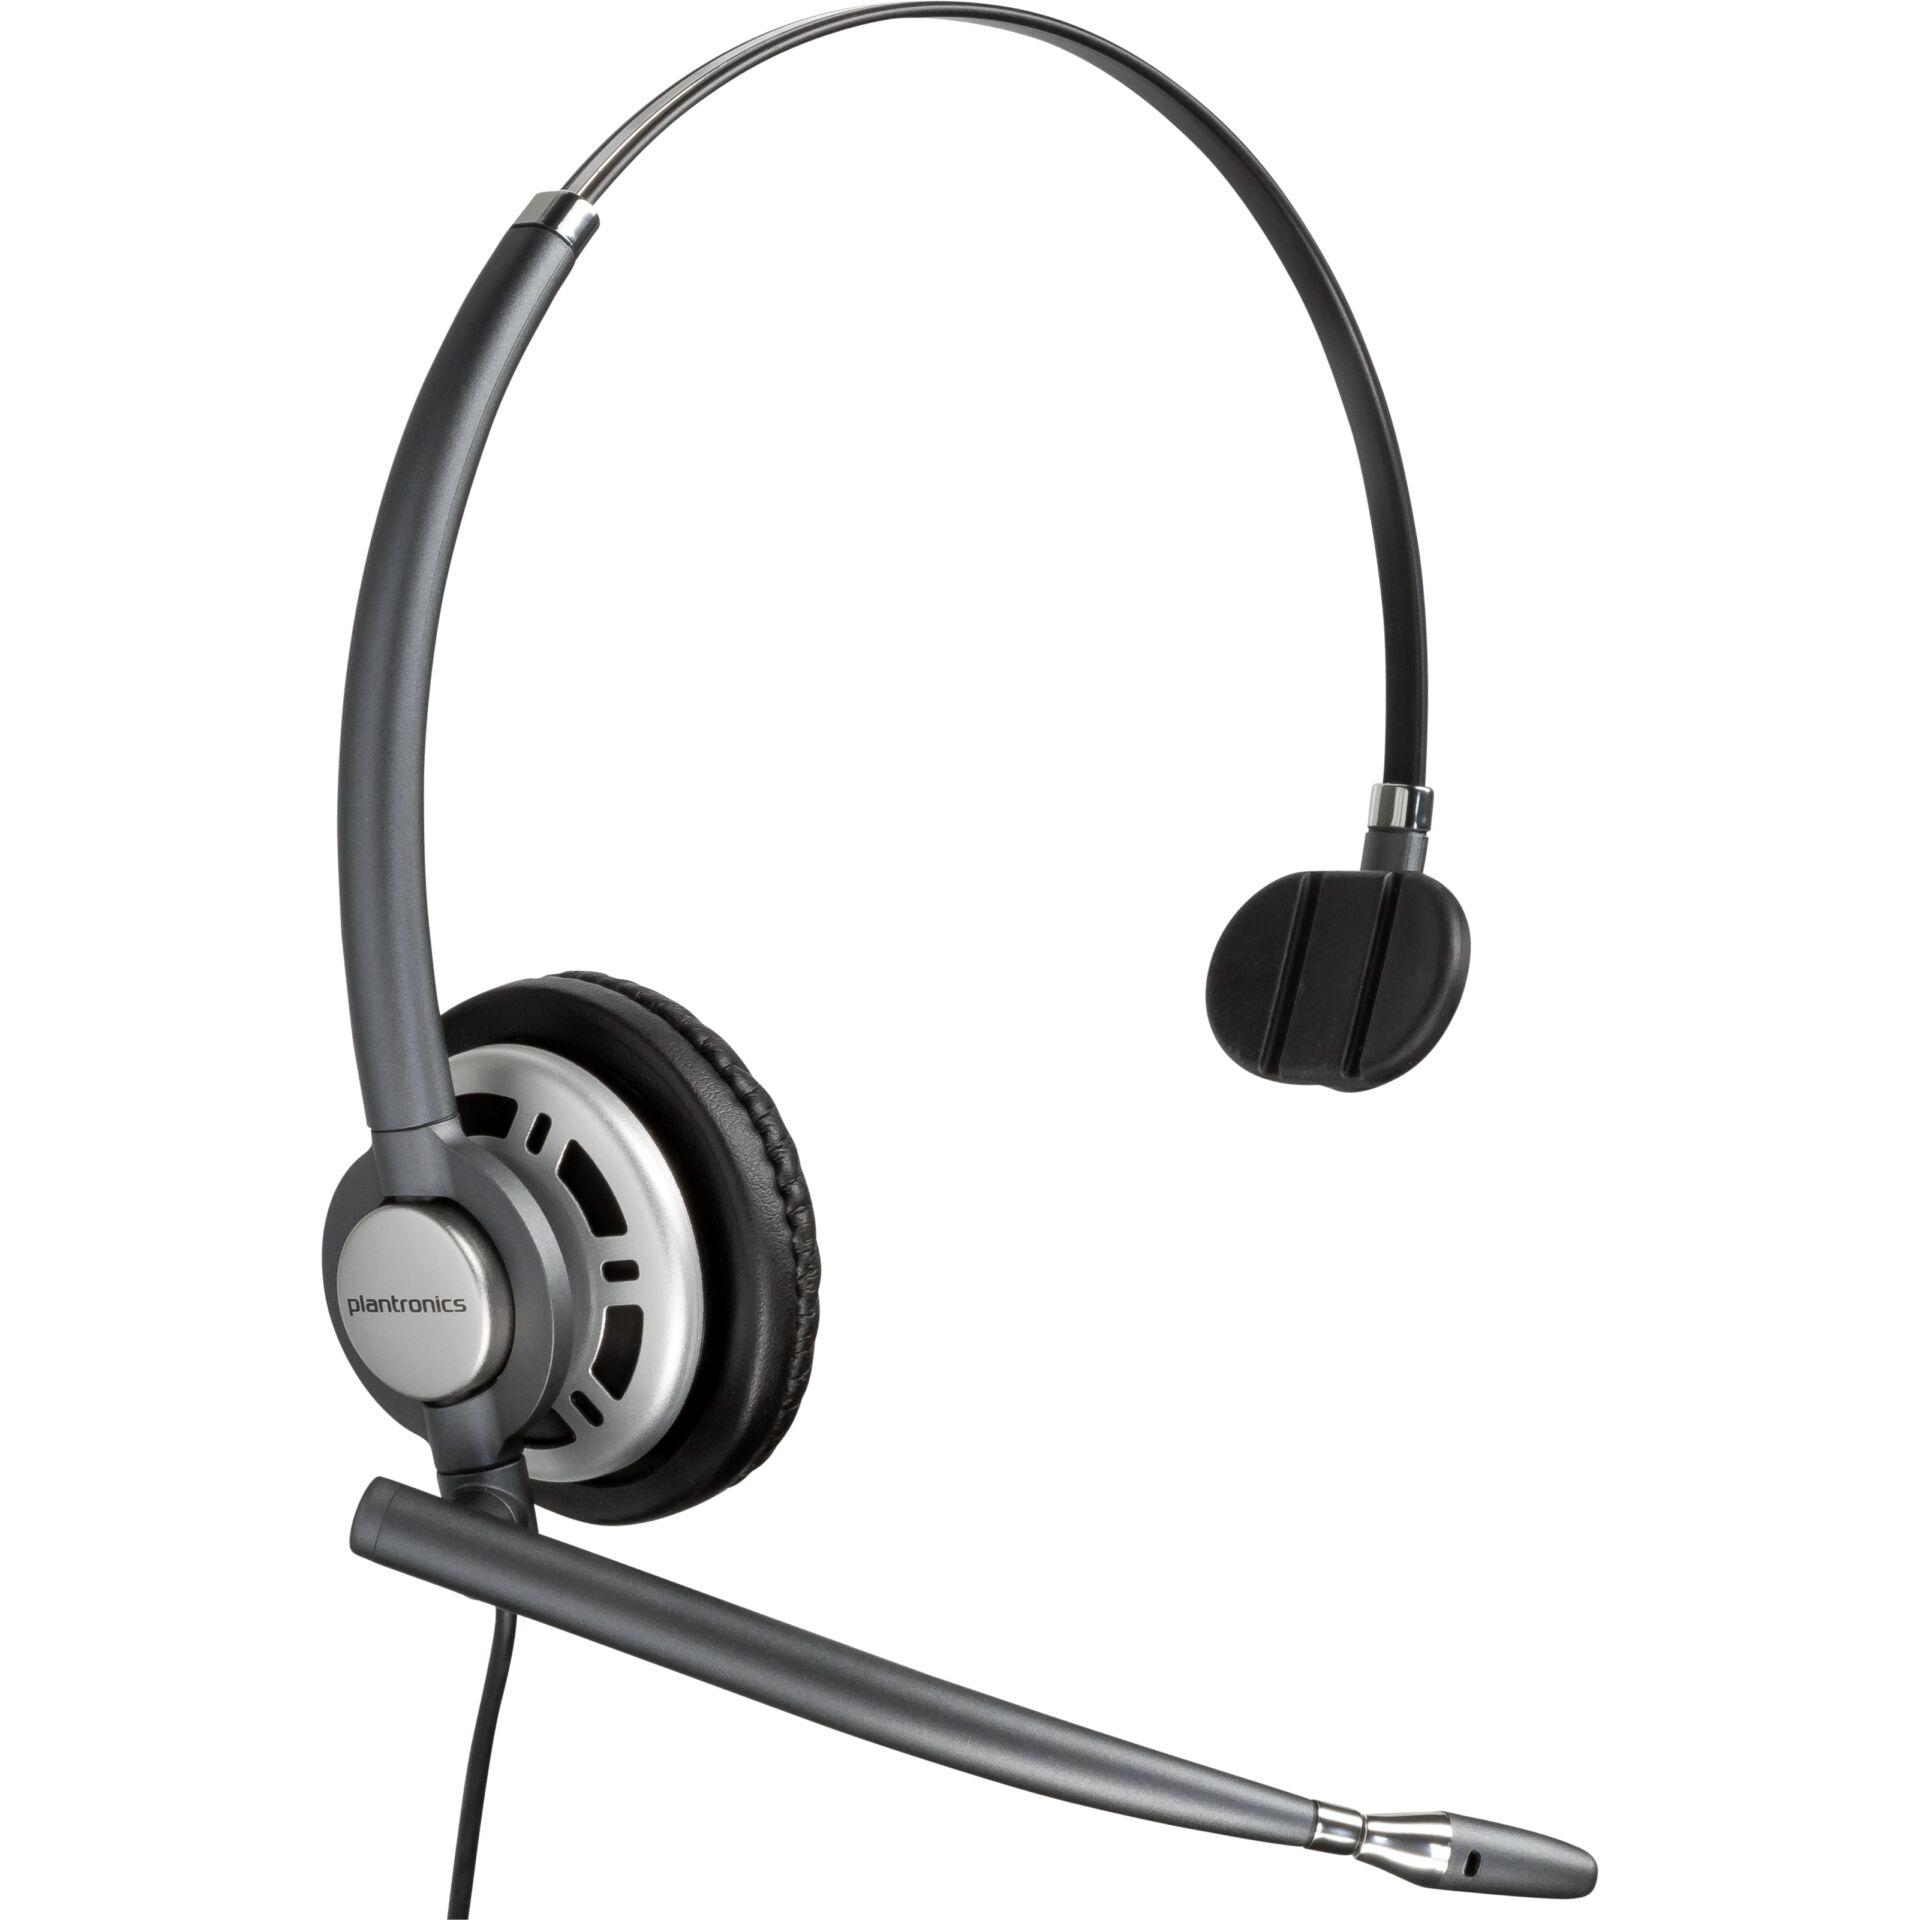 Plantronics EncorePro HW710 On-Ear Headset wired